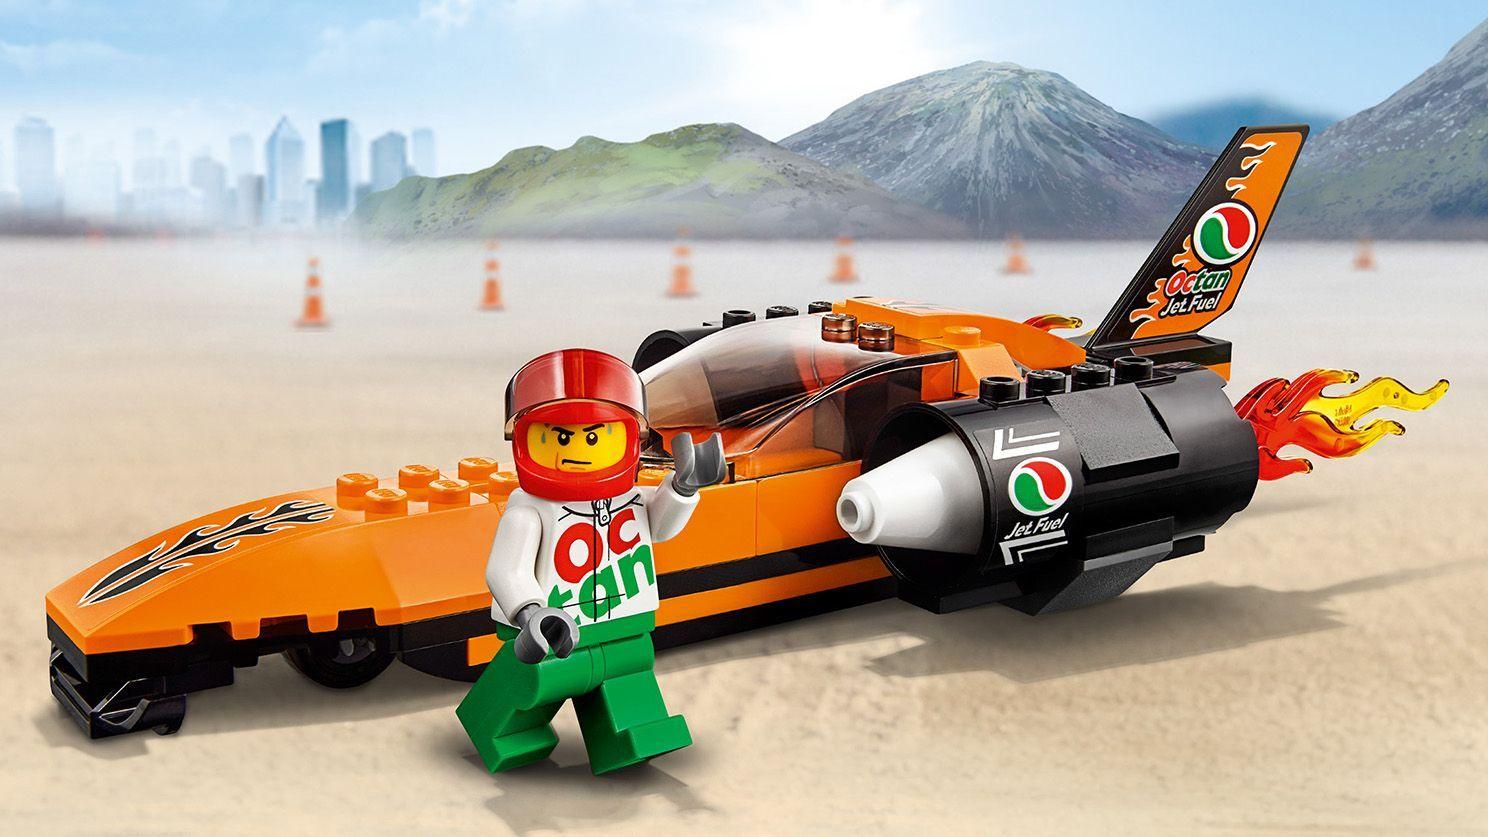 LEGO 60178 City Vehicles Speed Record Car